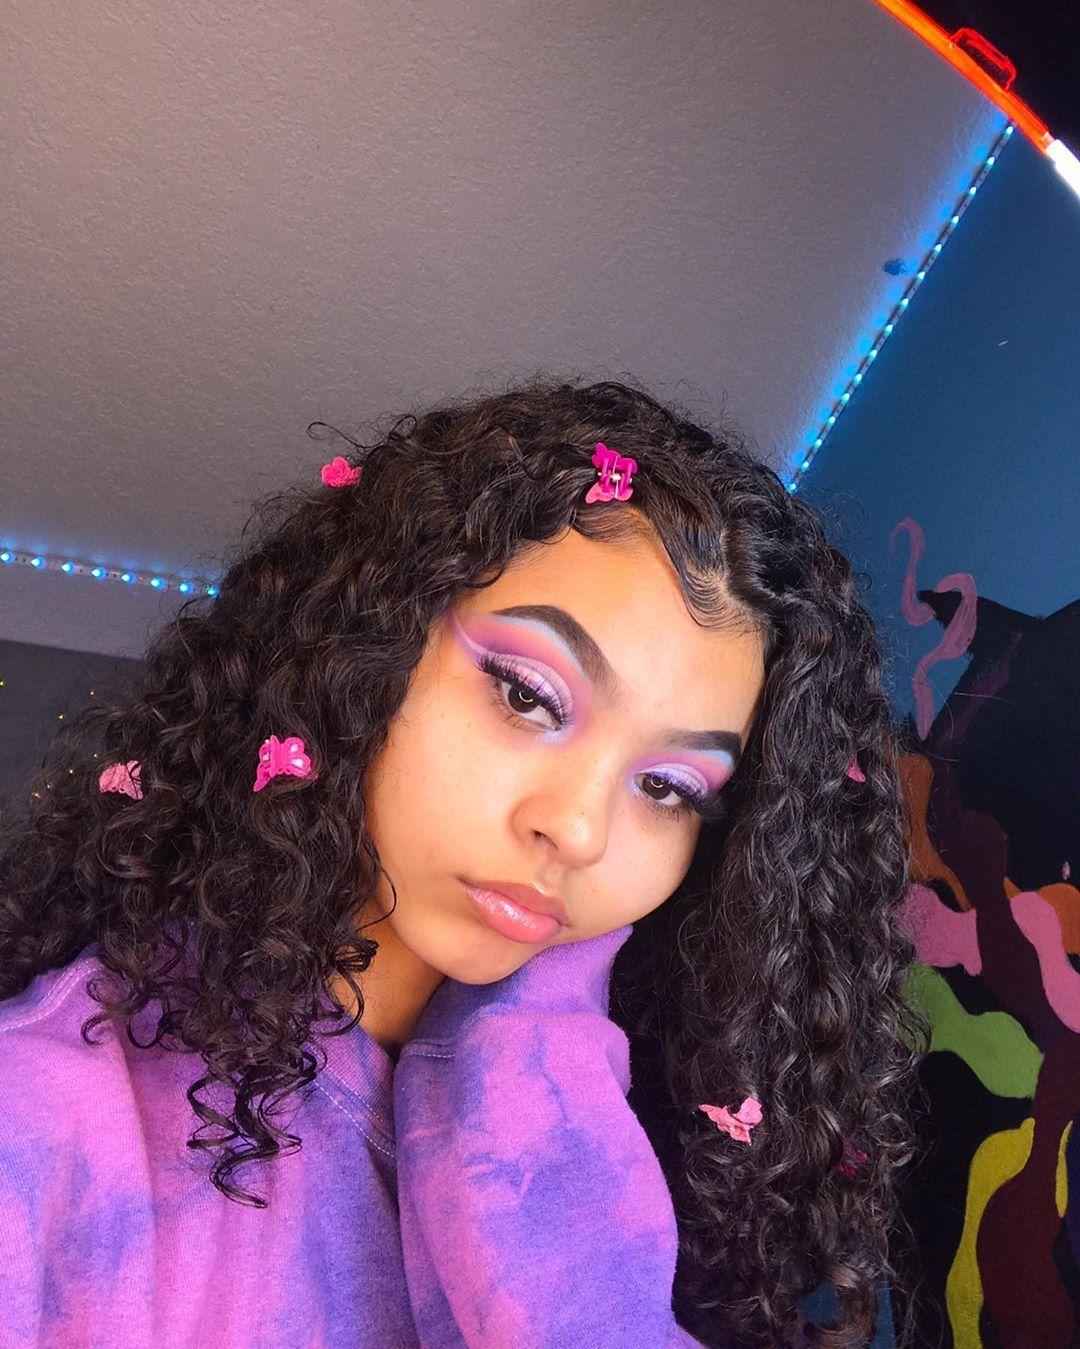 I Ll Be Back Or Not Buuut Byeeeeee In 2020 Hair Styles Curly Girl Hairstyles Aesthetic Hair